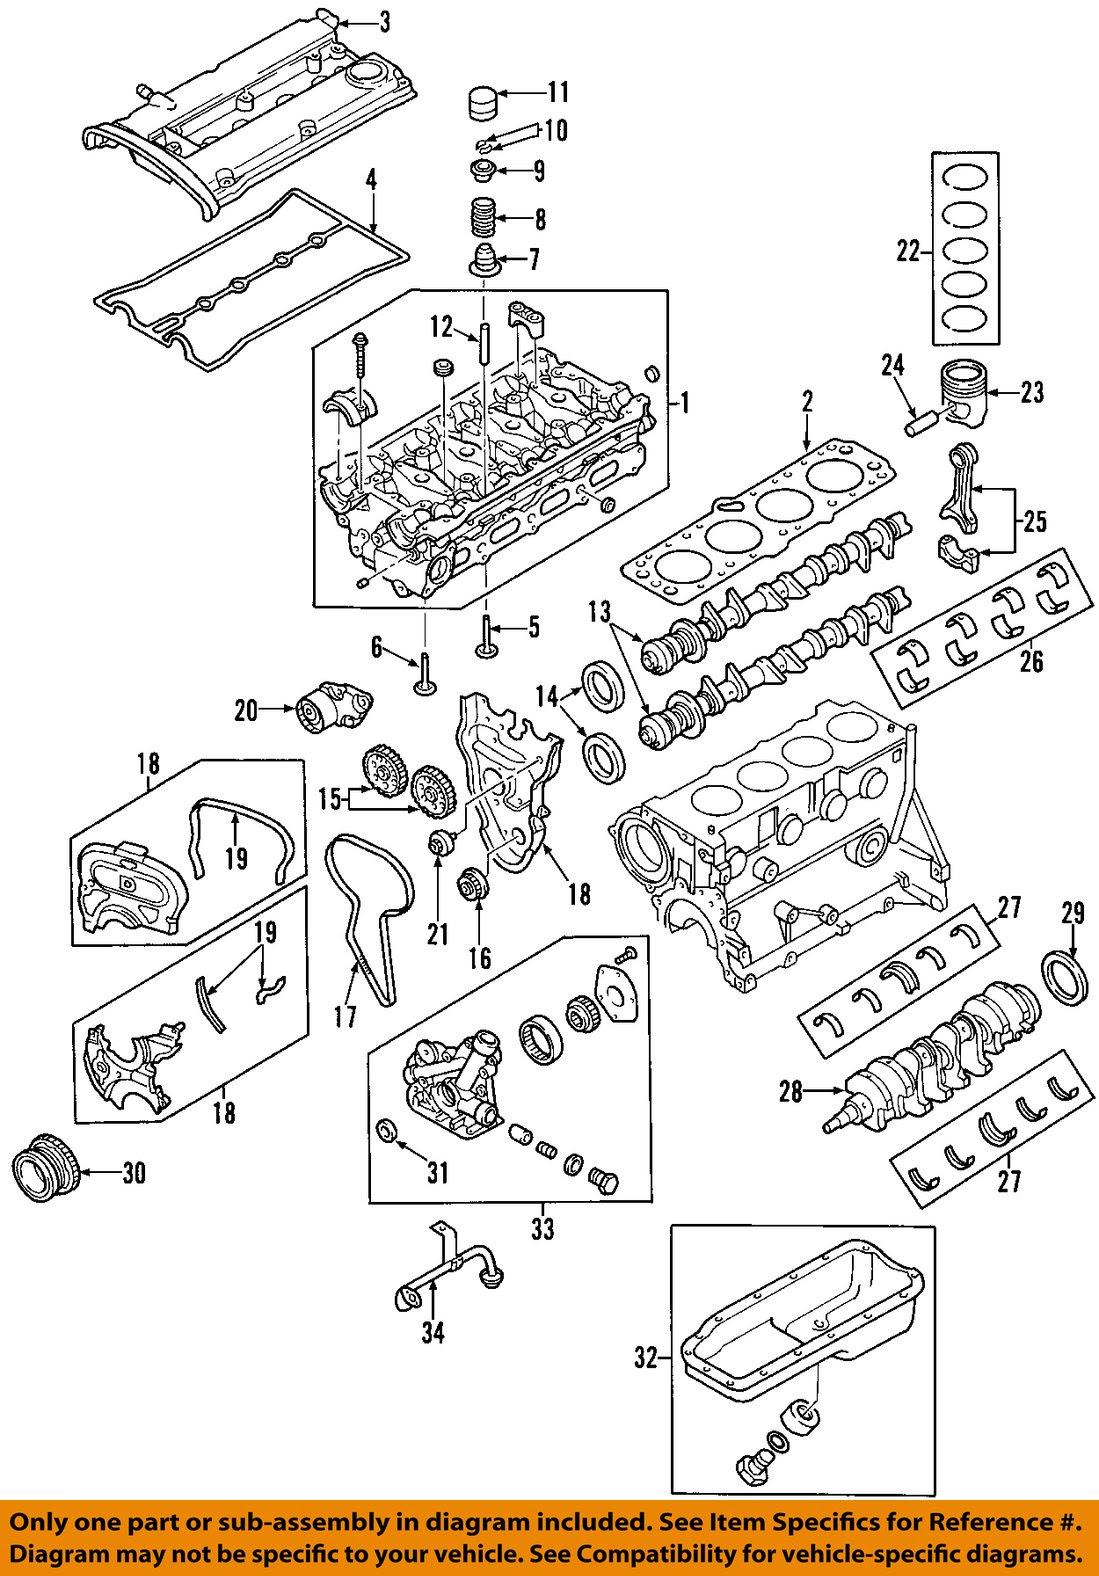 2007 Chevy Aveo Engine Diagram Wiring Diagram Slim Delta A Slim Delta A Cinemamanzonicasarano It